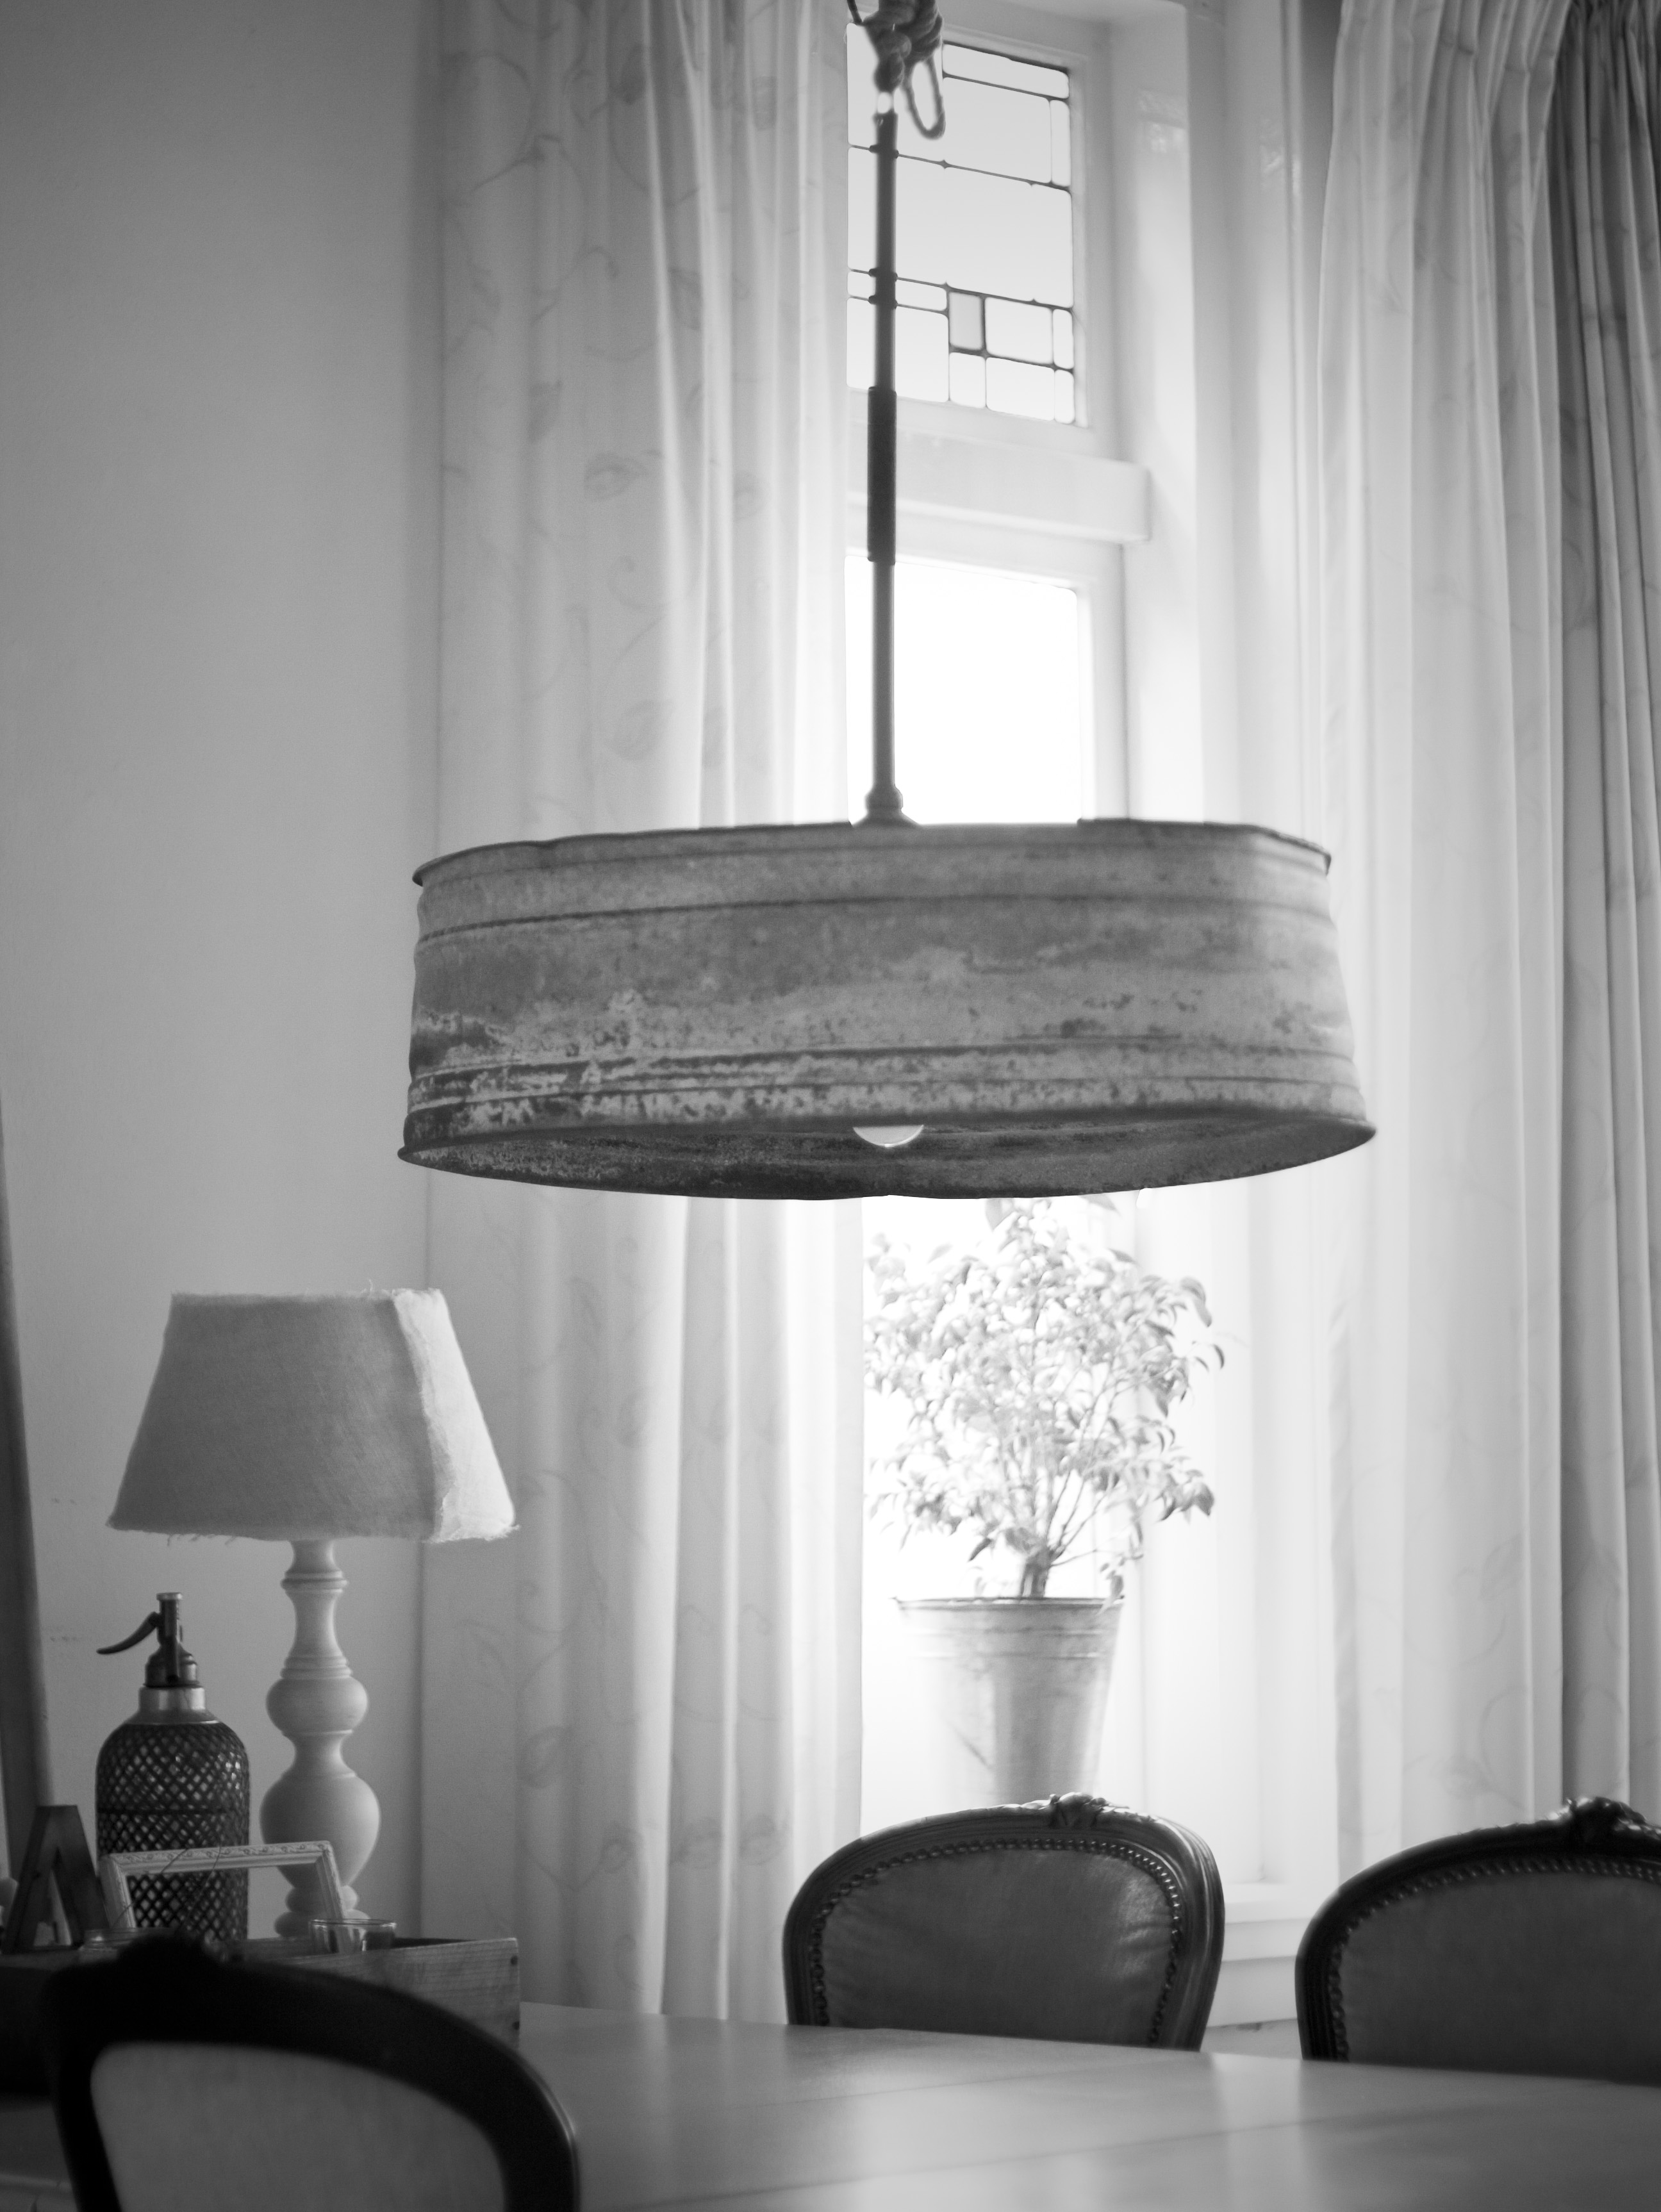 Zinc lighting : Aline Sietsema